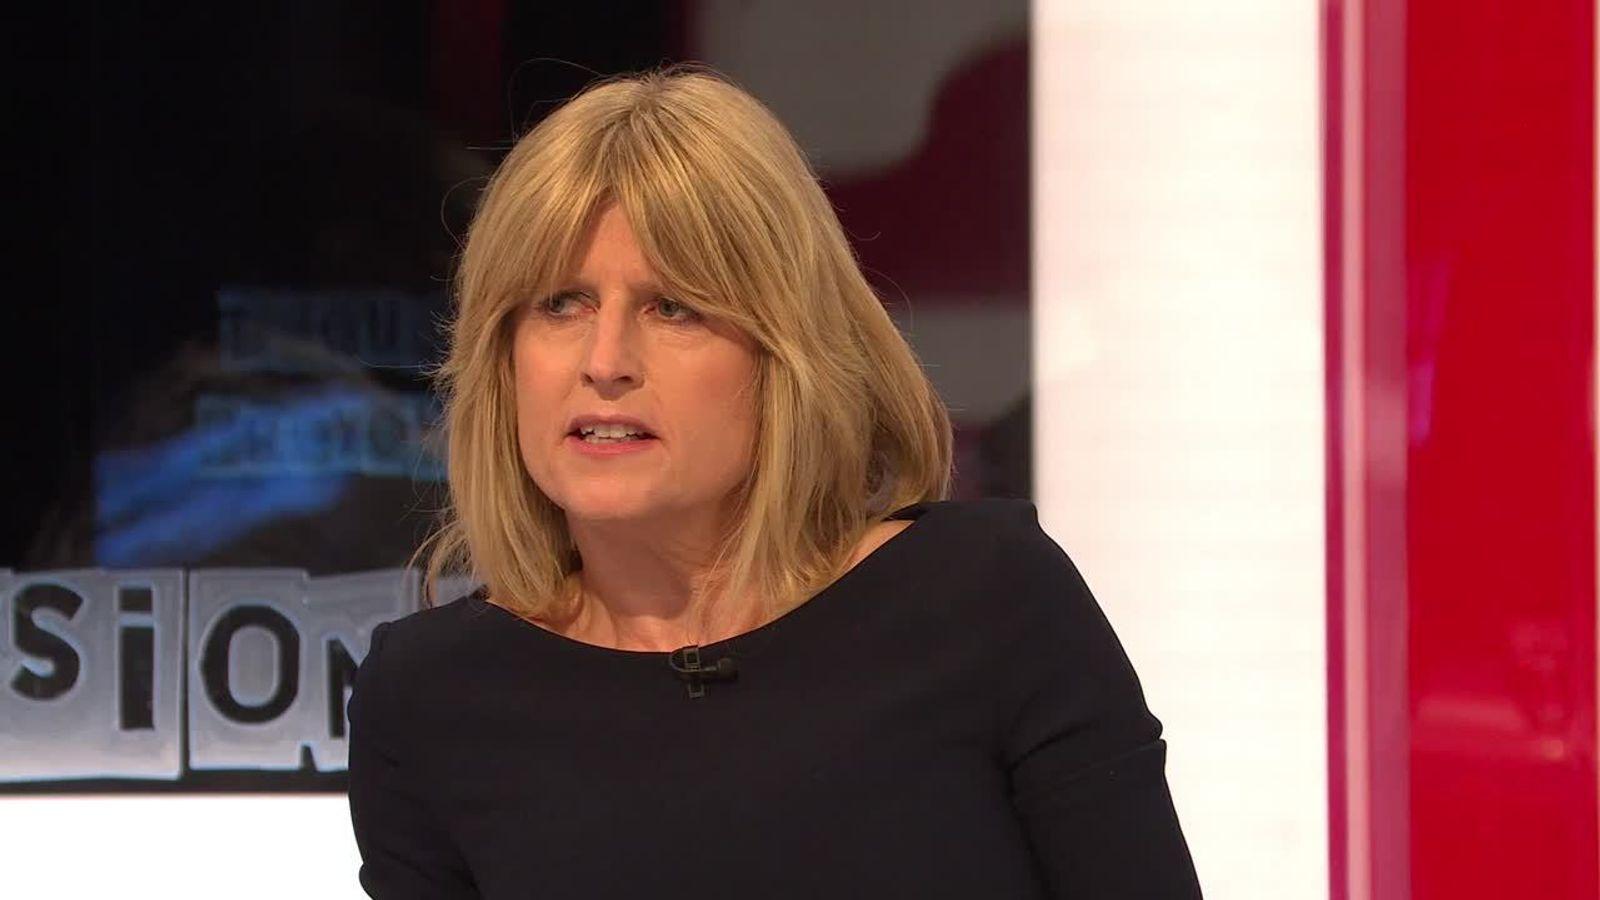 Boris Johnsons language was tasteless - says his sister